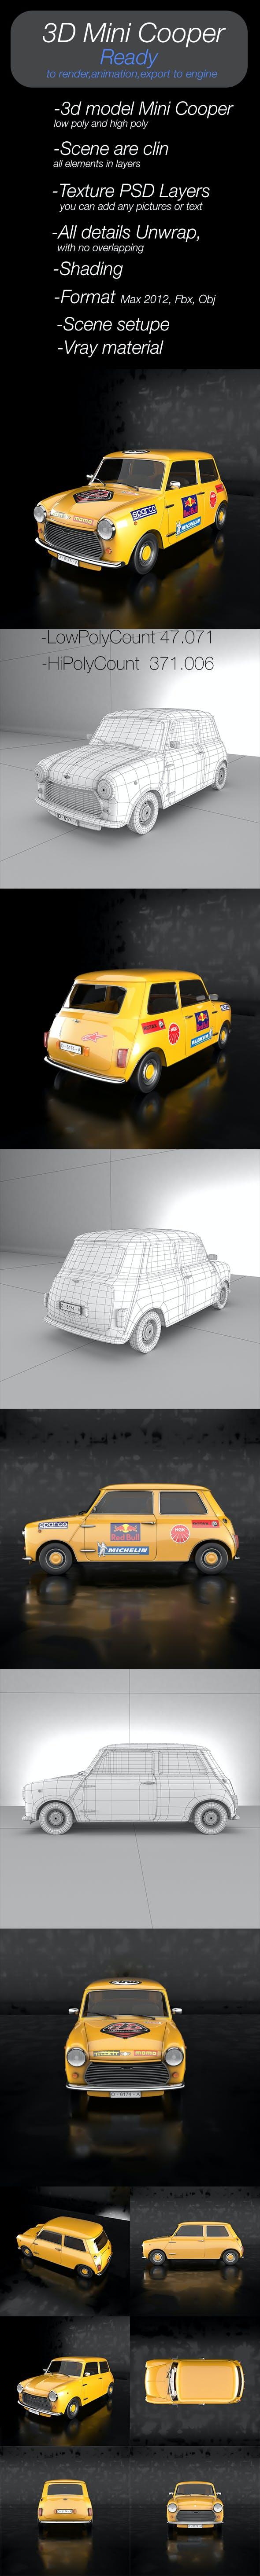 3D model Mini Cooper - 3DOcean Item for Sale